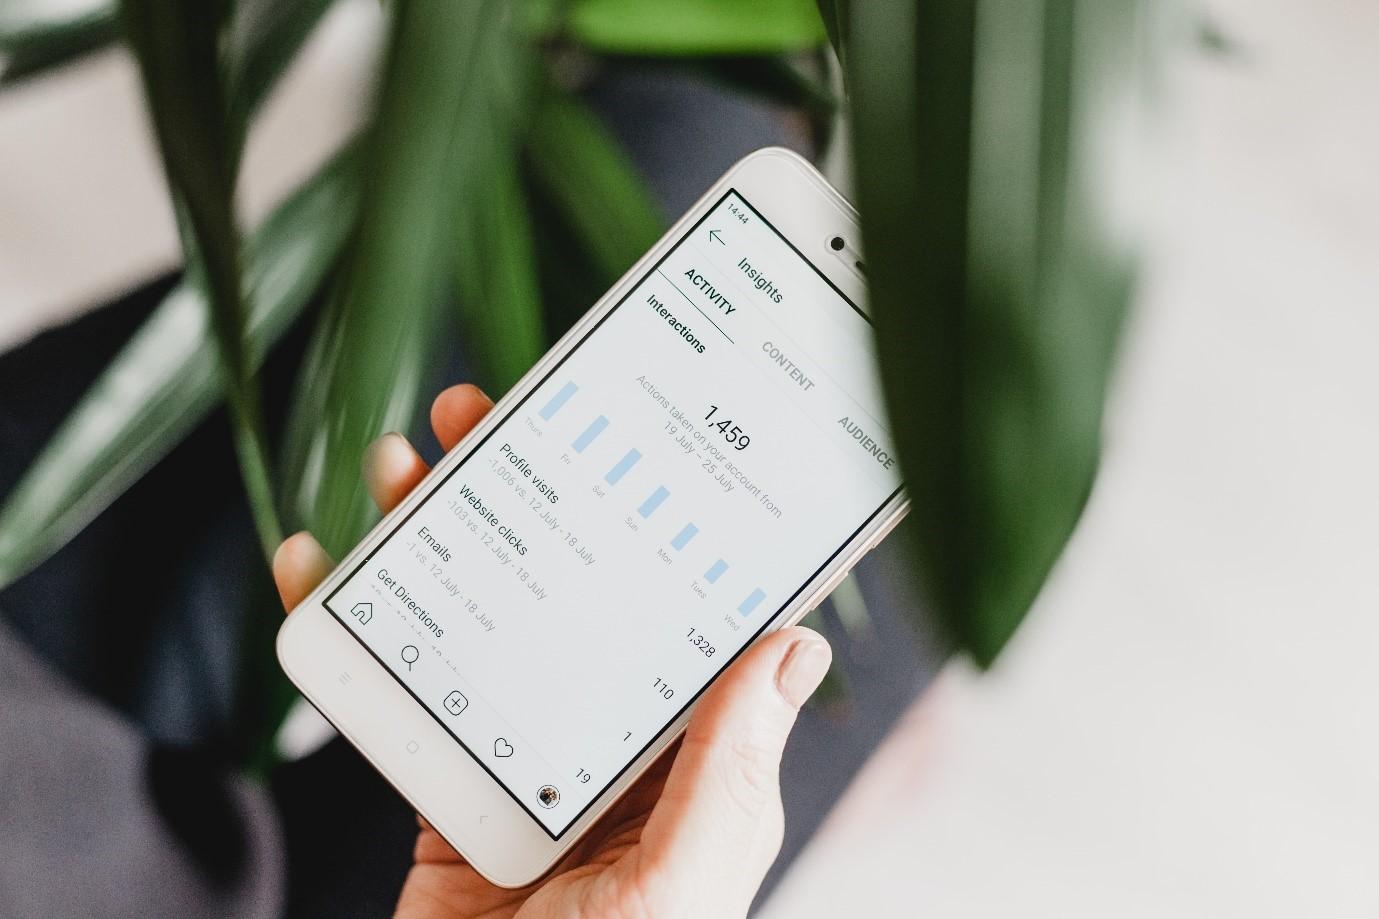 Social Media Do's and Don'ts for App marketing